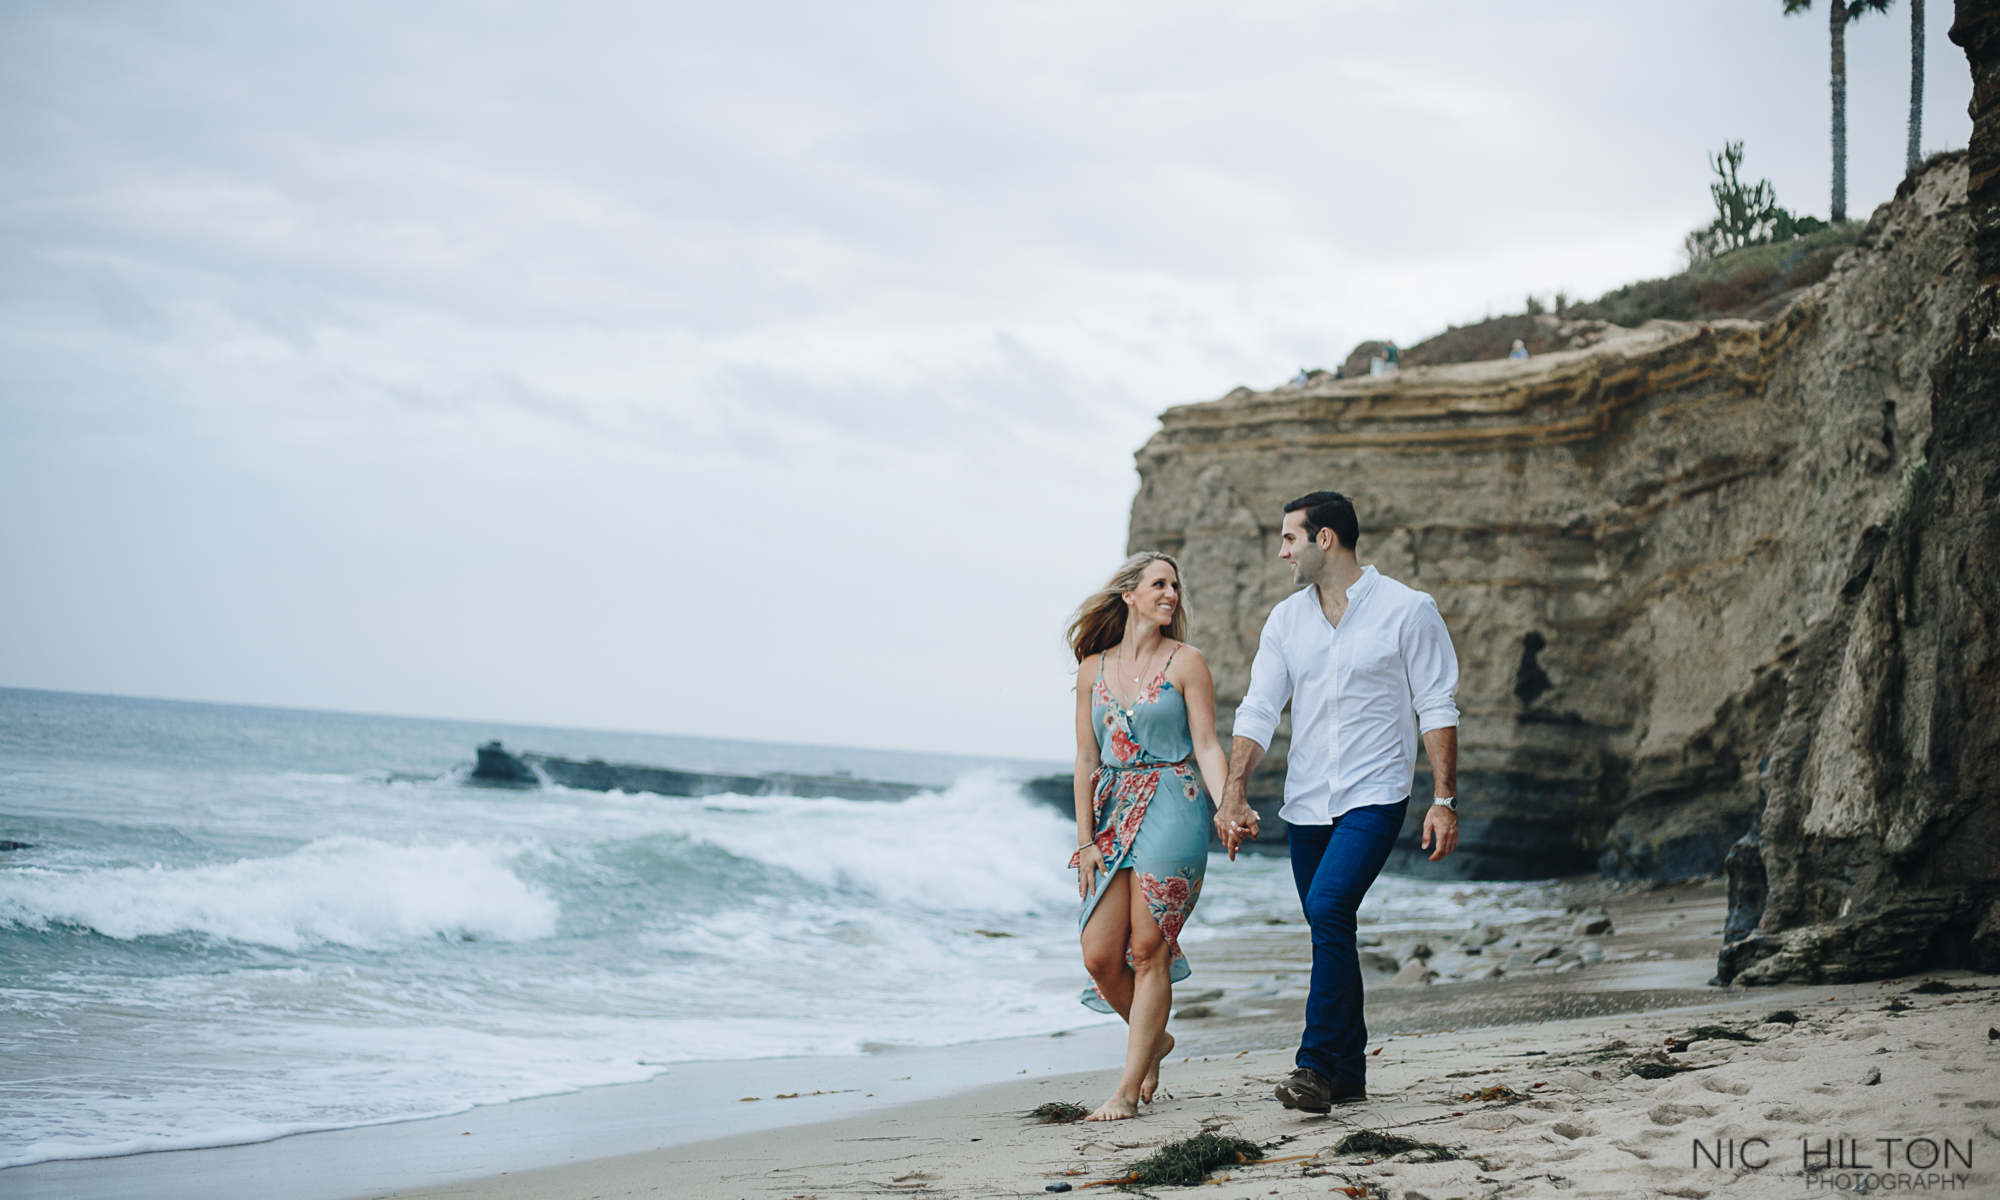 San-Diego-Beach-Sunset-Cliffs-Engagement.jpg